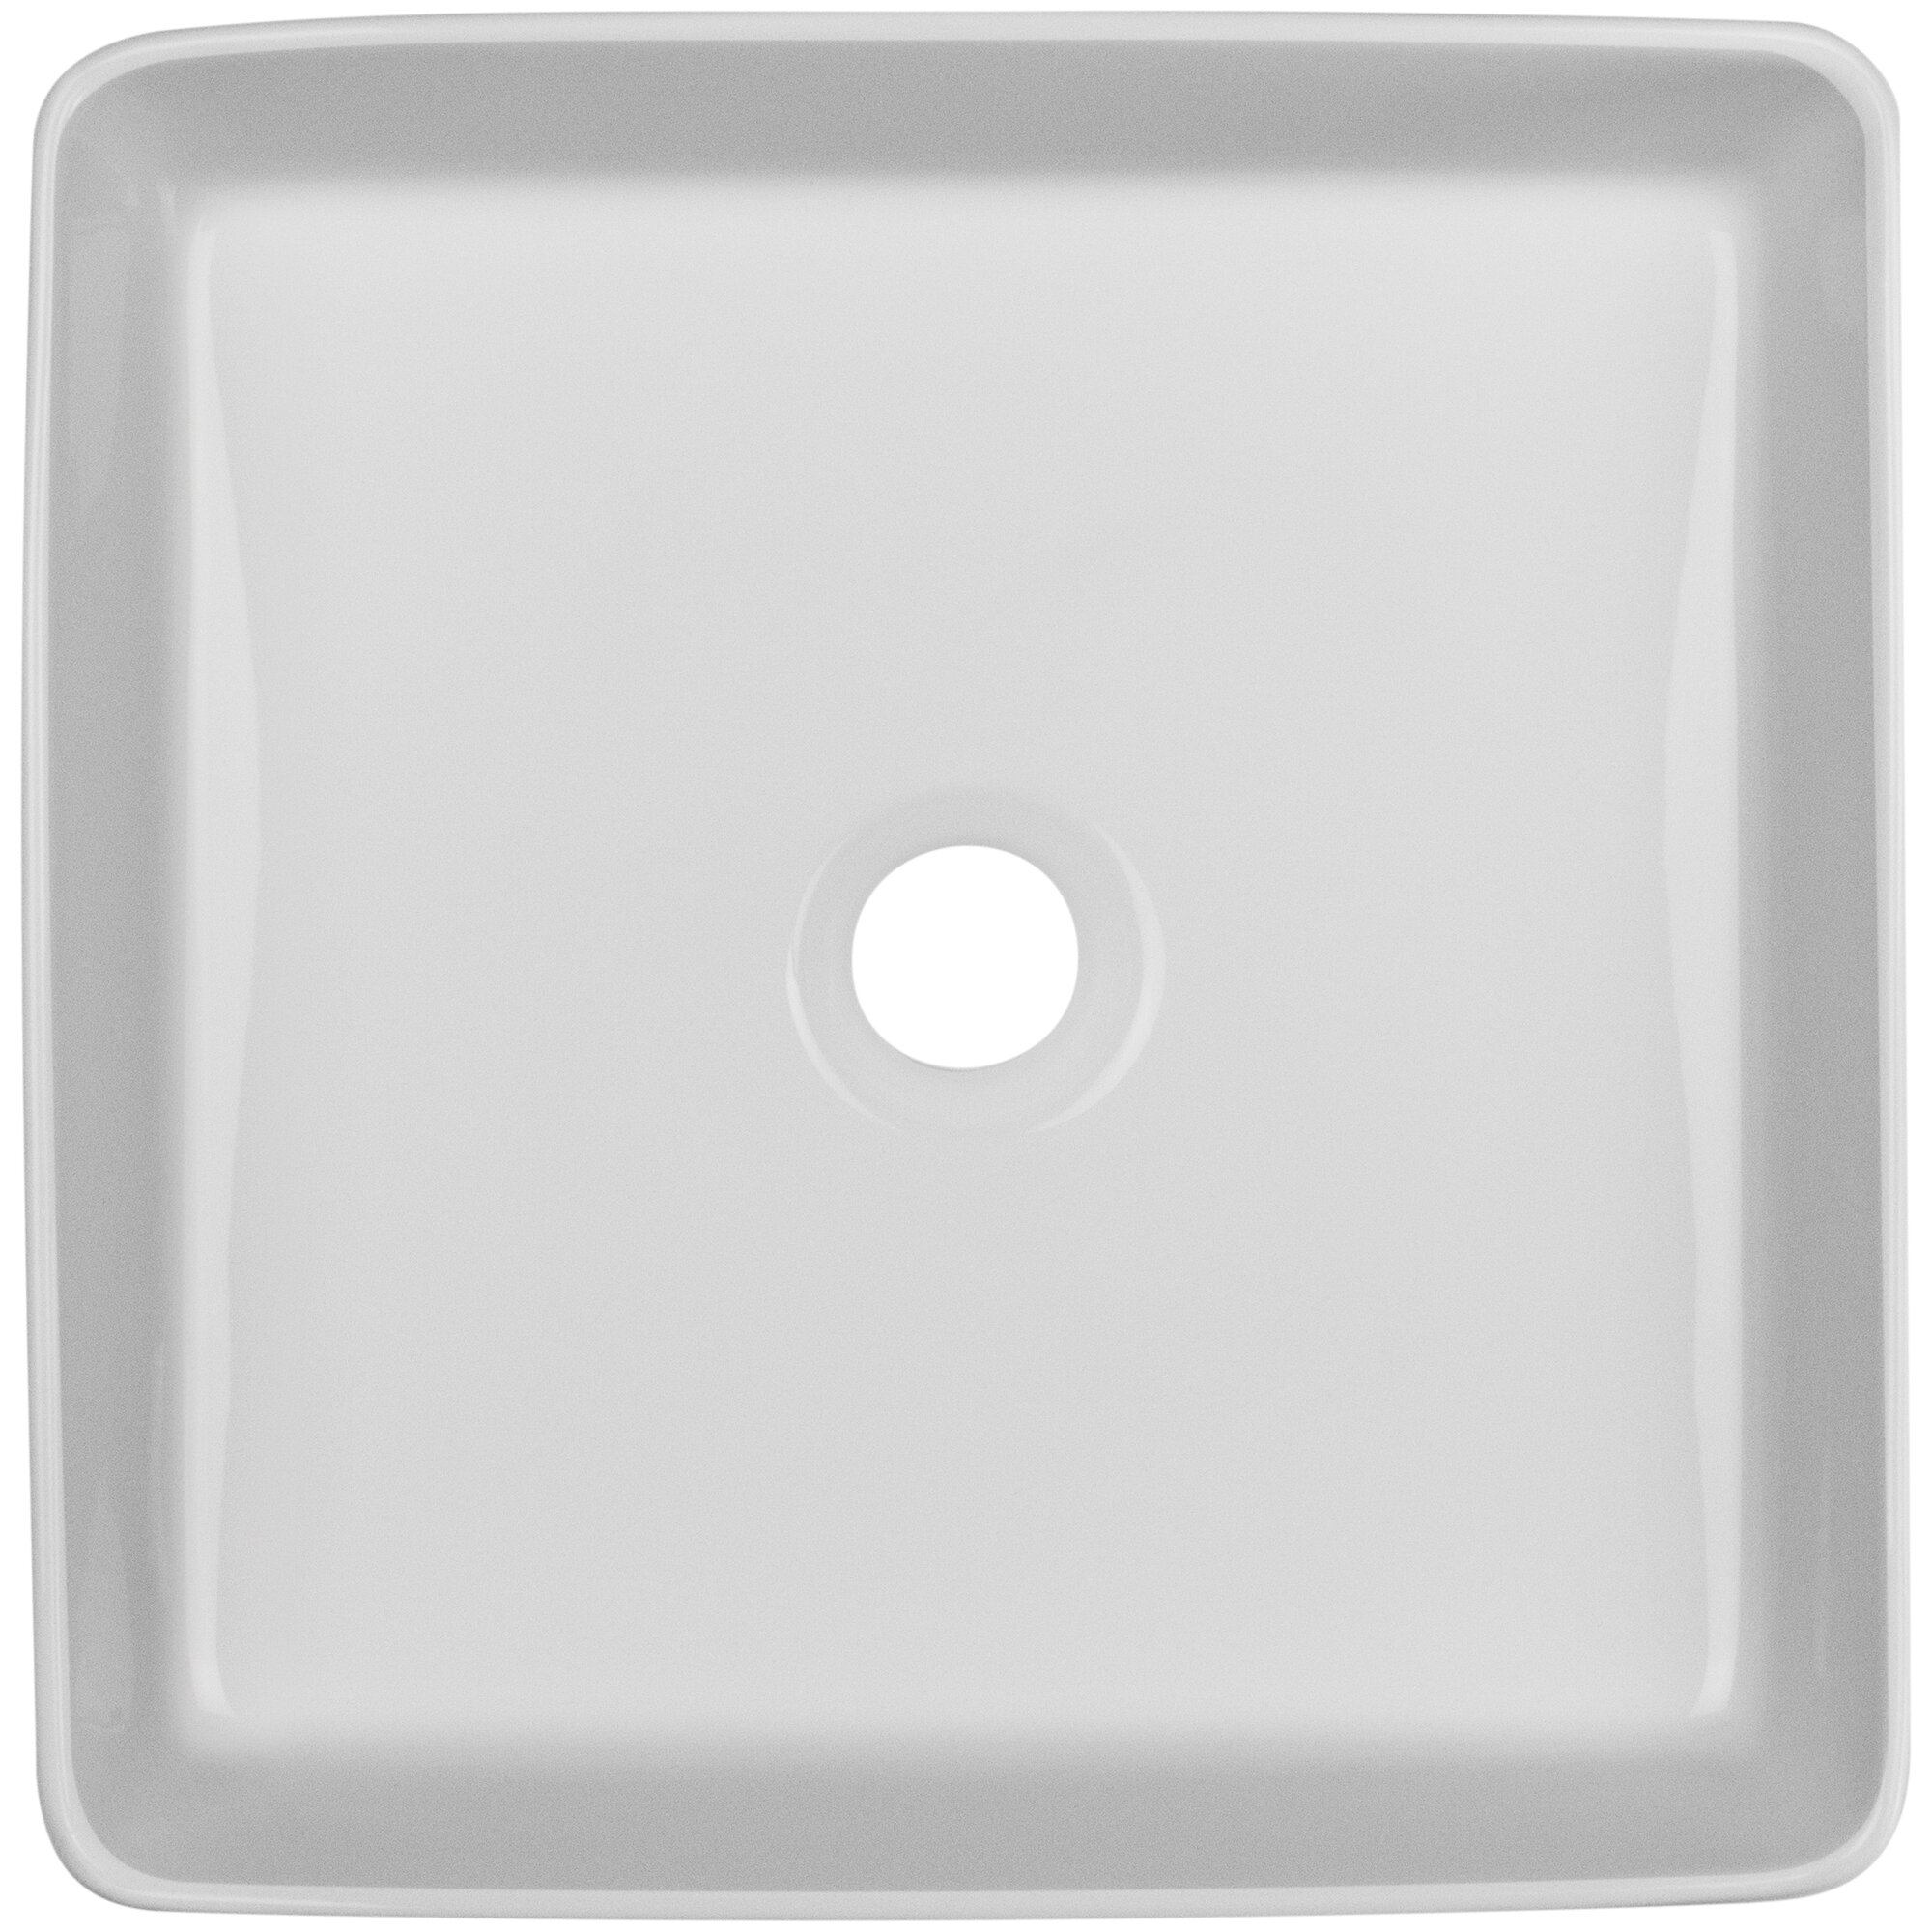 Nautilus Series Vitreous China Square Vessel Bathroom Sink